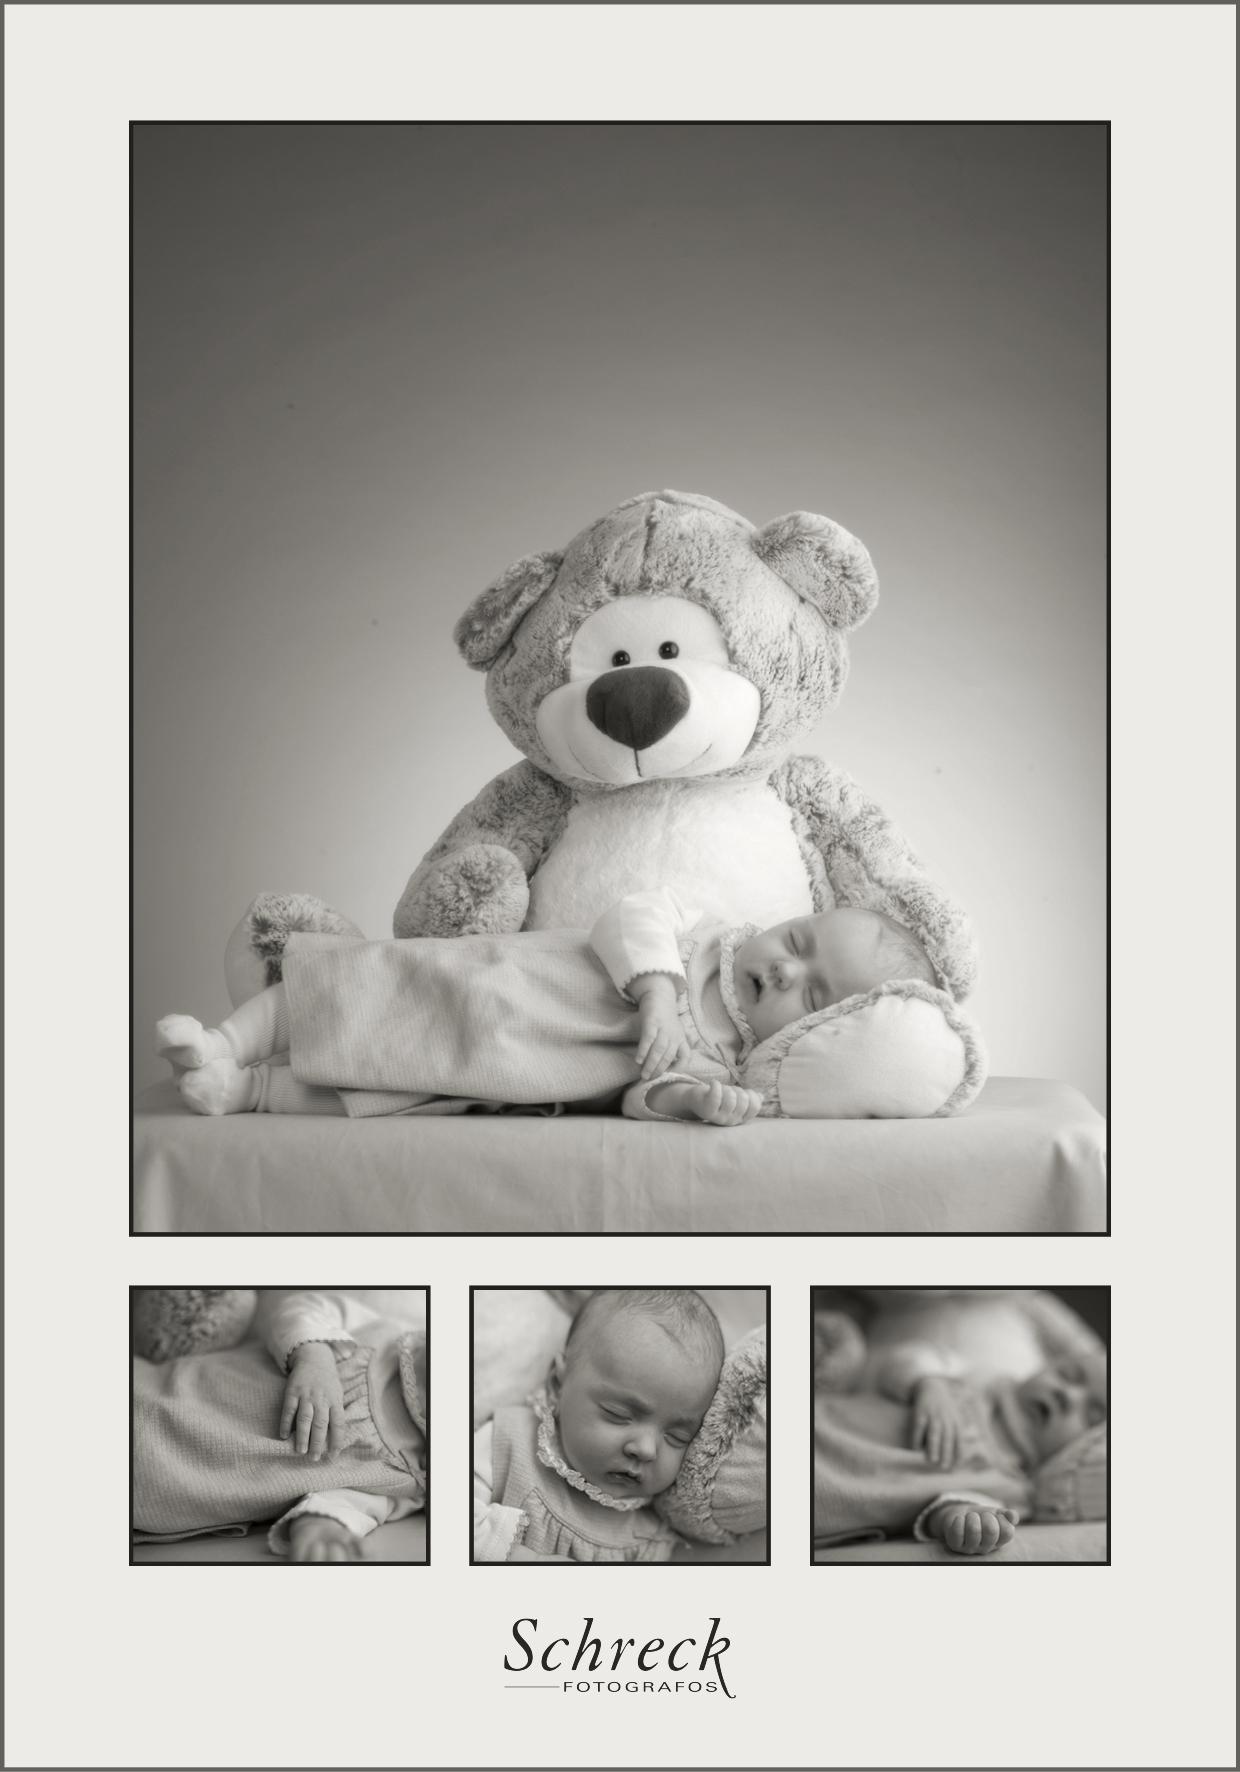 New born Schreck fotógrafos 4